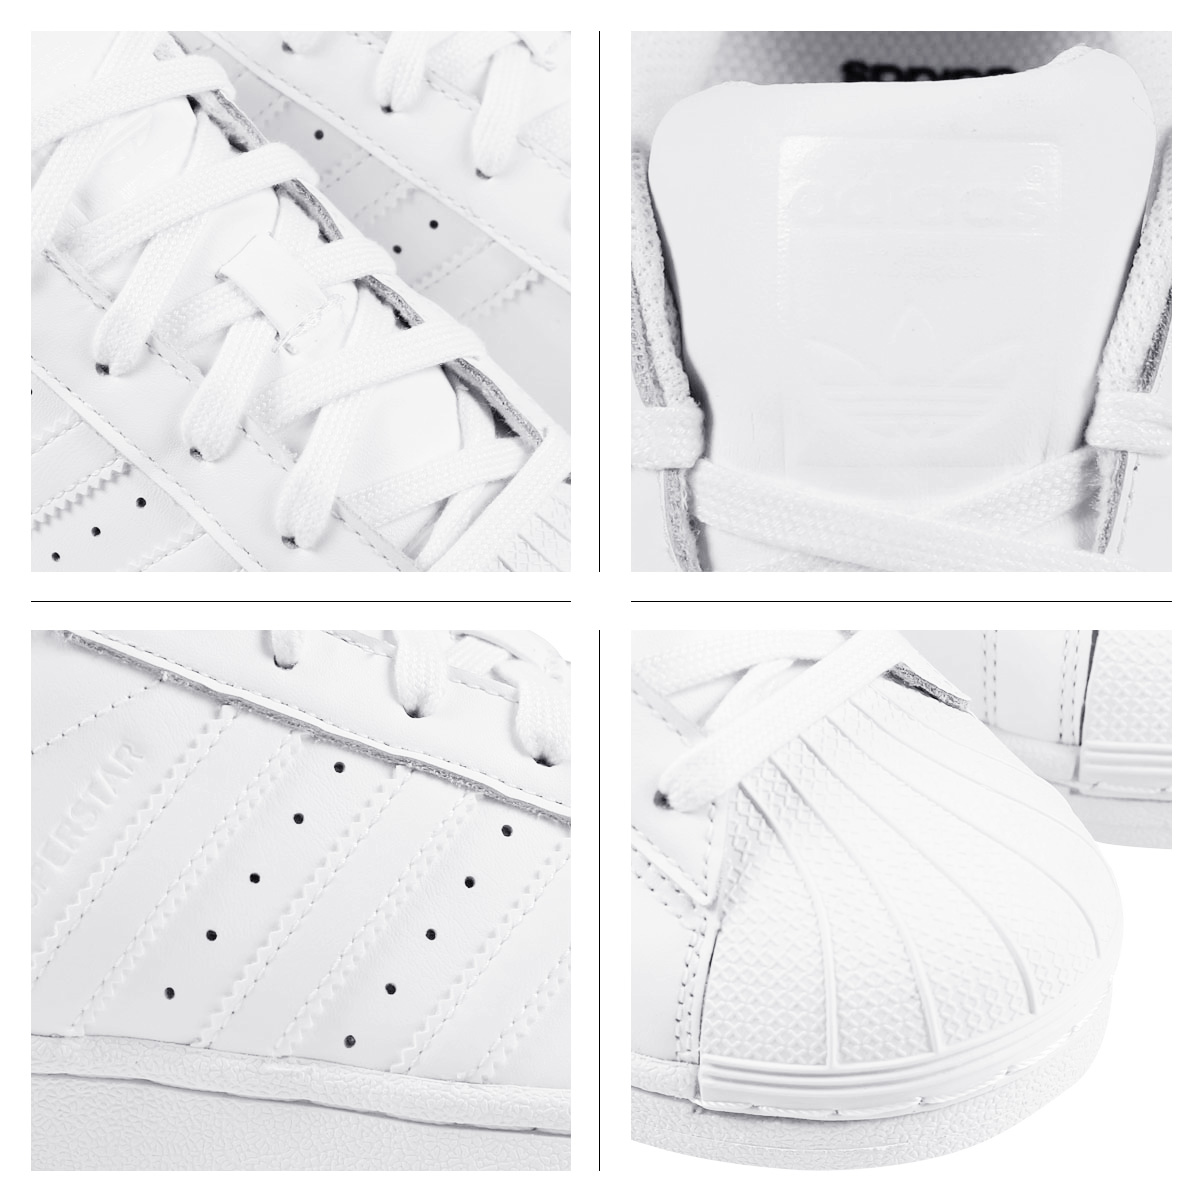 Adidas Superstar 7 jZJq2Y